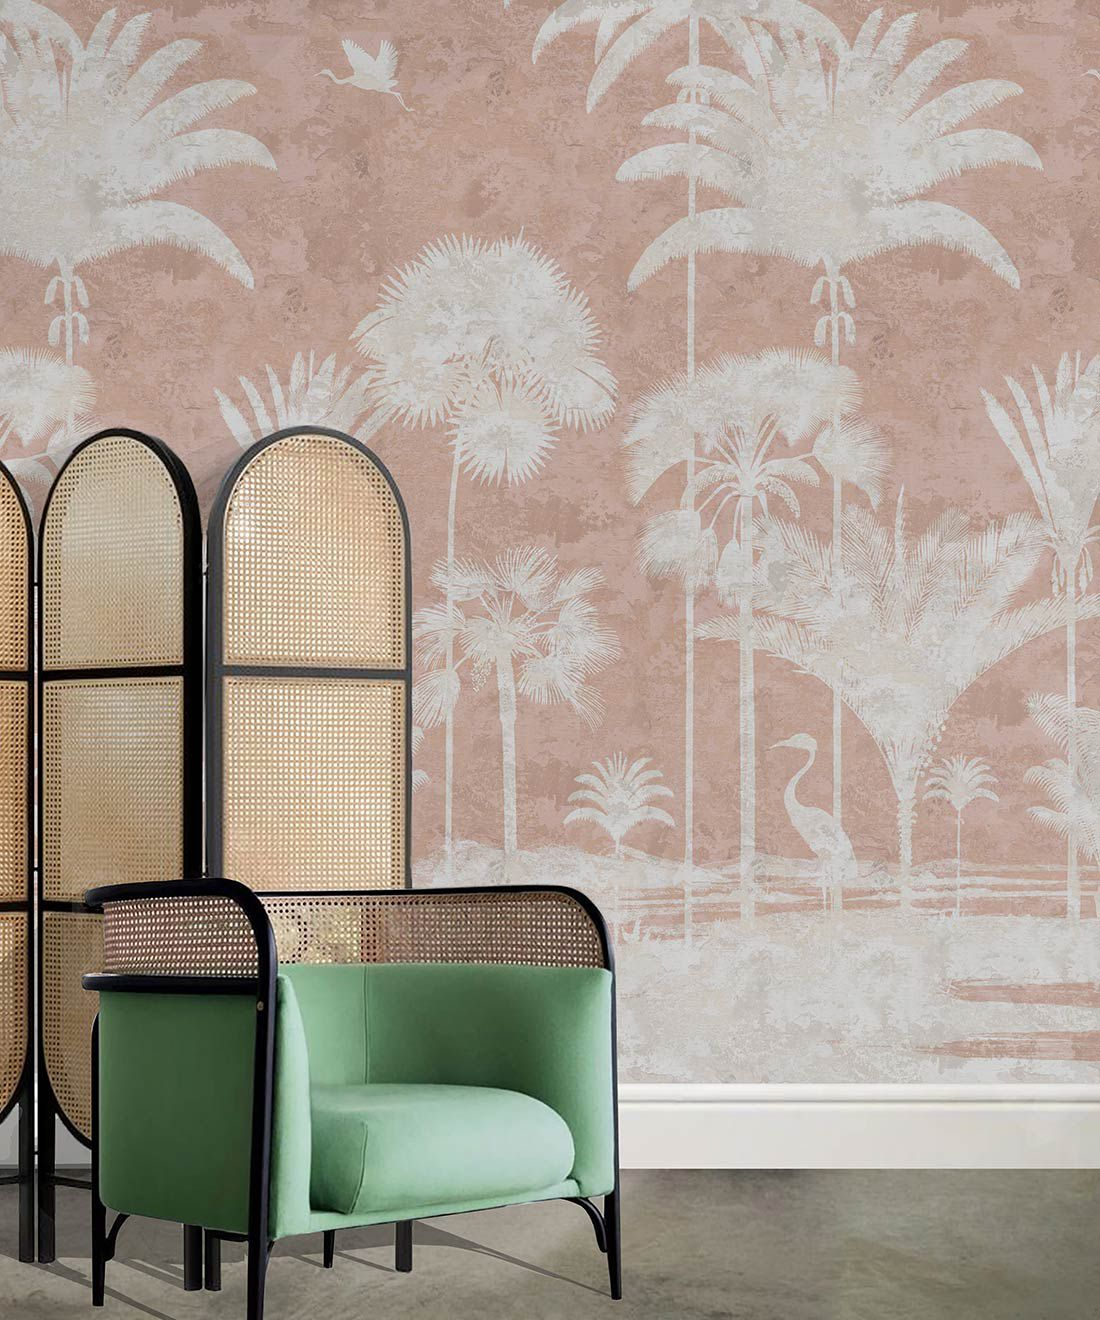 Shadow Palms Wallpaper Mural •Bethany Linz • Palm Tree Mural • Pink • Insitu